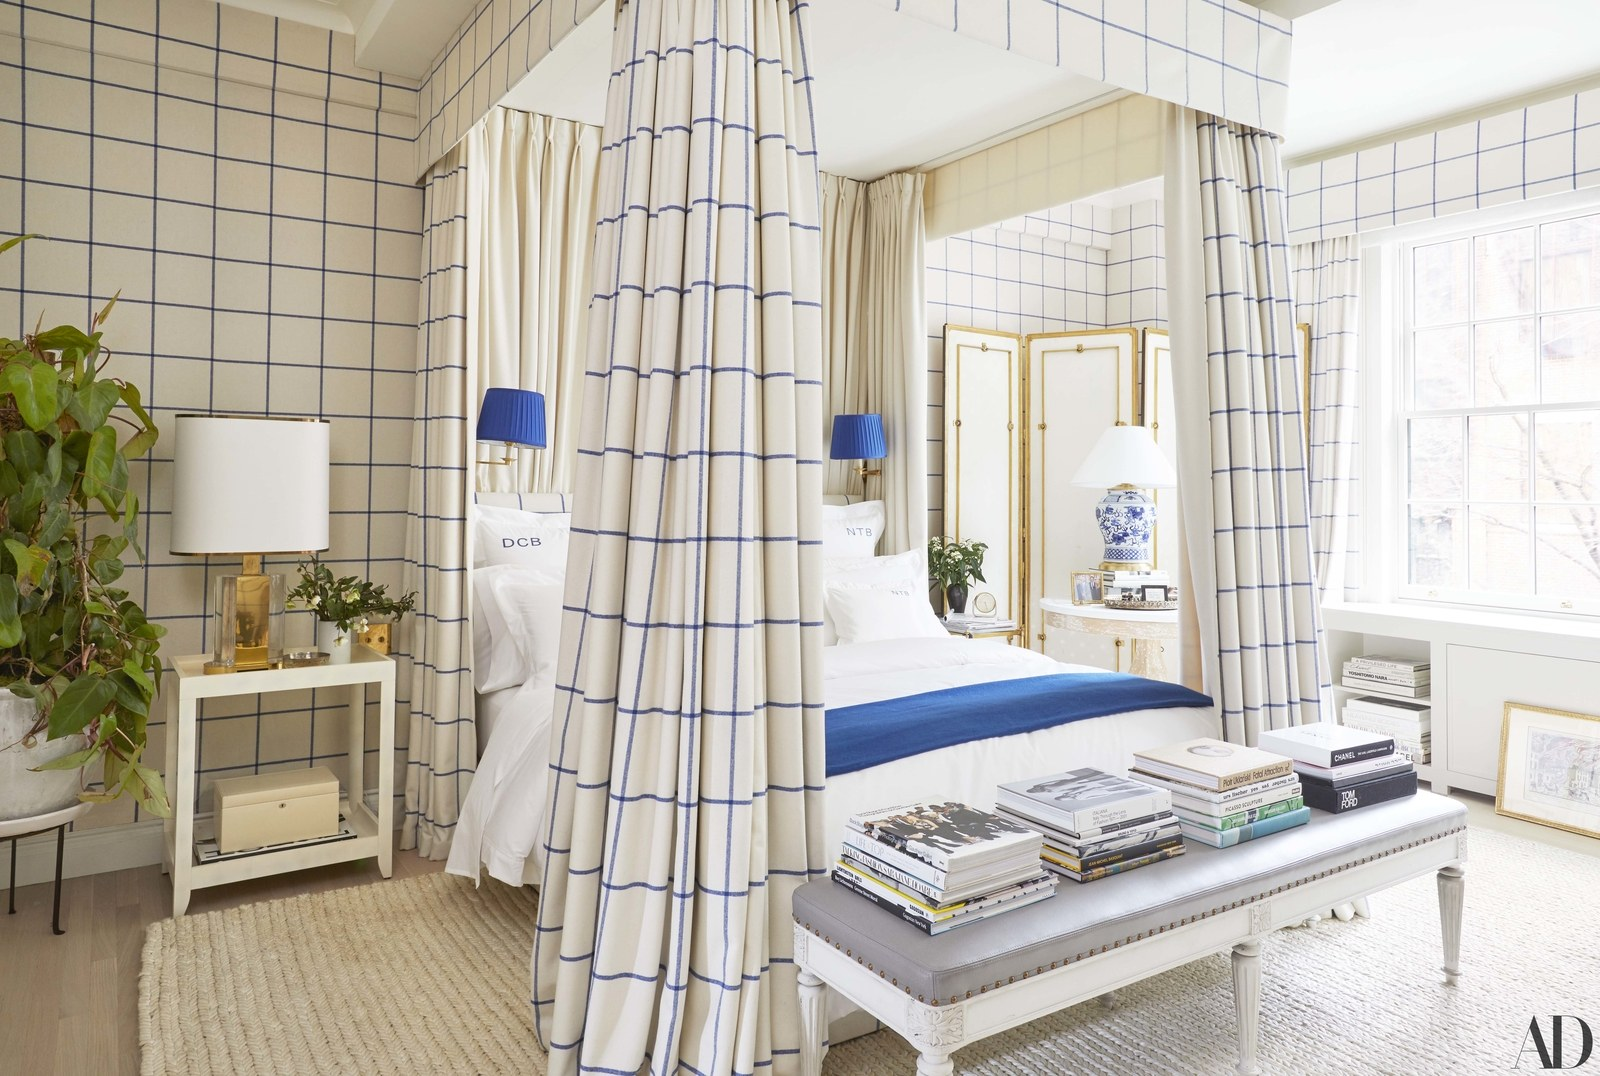 Derek blasberg's Manhattan home / design: Virginia tupker / architectural digest / photo: gieves Anderson / snap up this  blue and white lamp